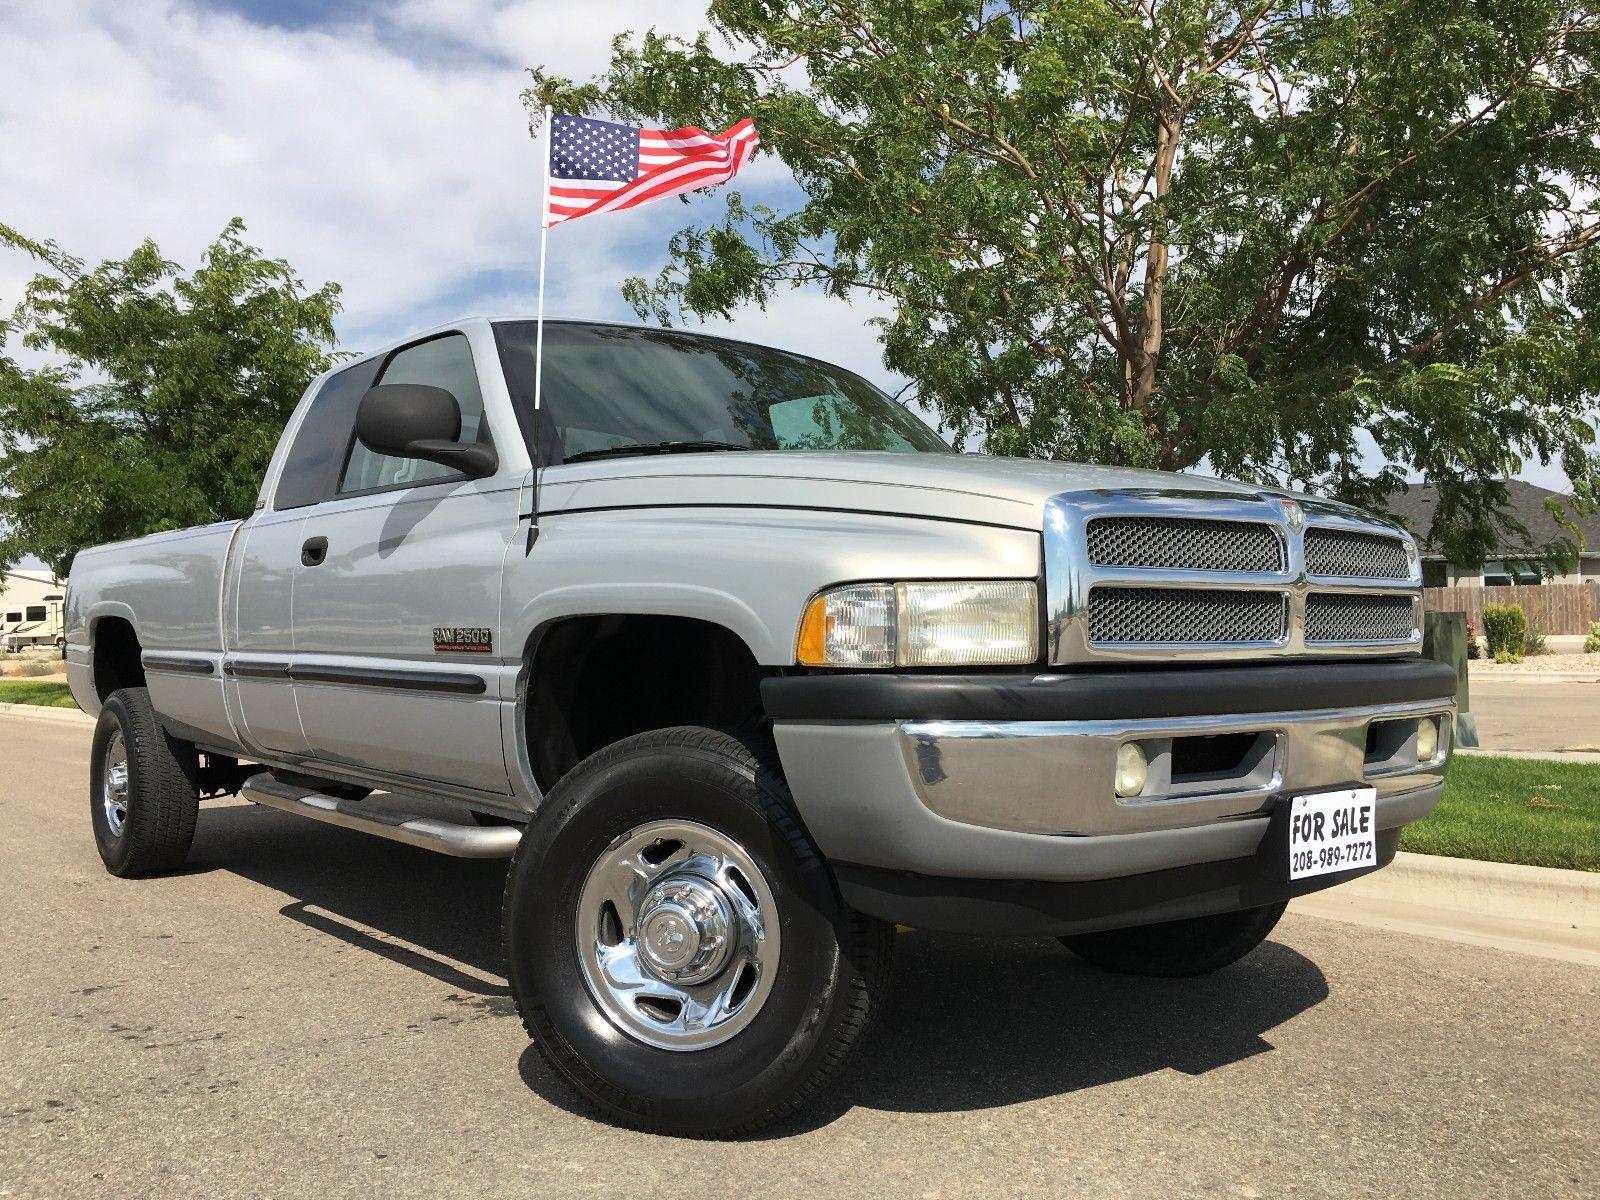 1999 Dodge Ram 2500 Slt 1999 Dodge 2500 Quad Cab Turbo Cummins Diesel 100 Rust Free West Coast Truck 2017 2018 24carshop Com